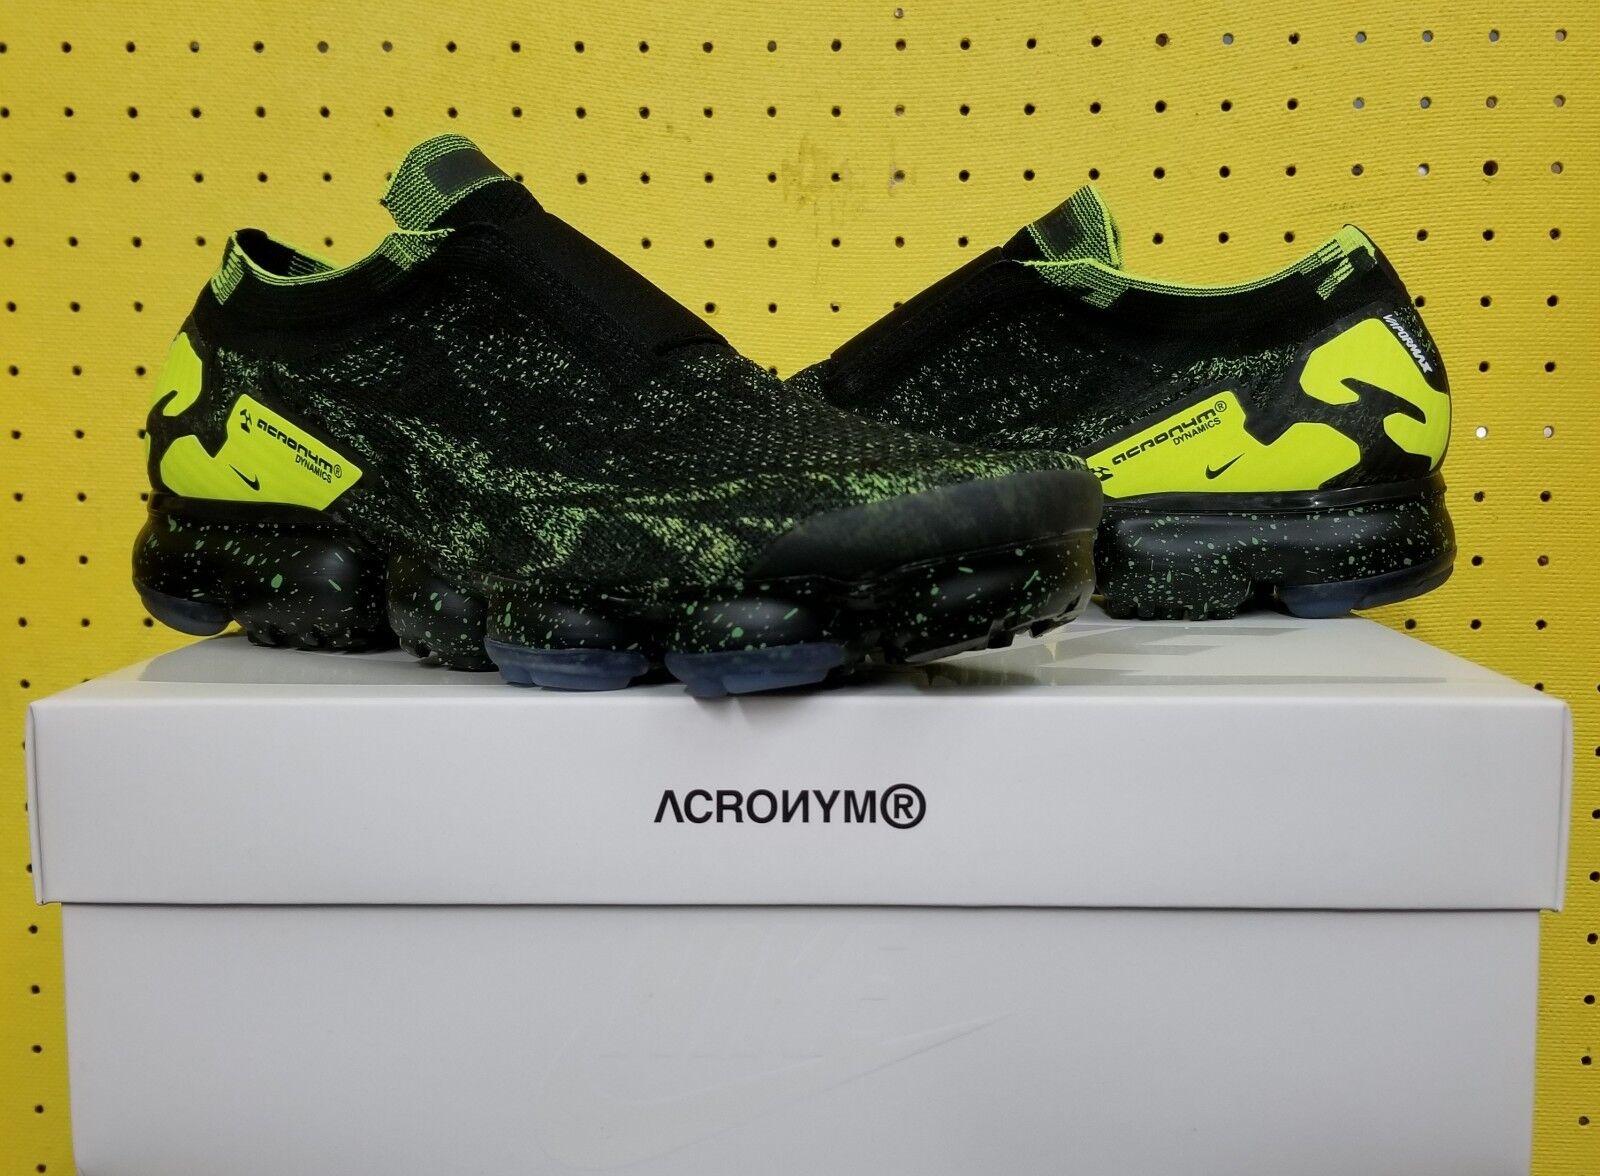 BRAND NEW Men's Nike Air Vapormax PK Moc 2 Acronym Sz 9.5 Black Volt AQ0996 007 New shoes for men and women, limited time discount